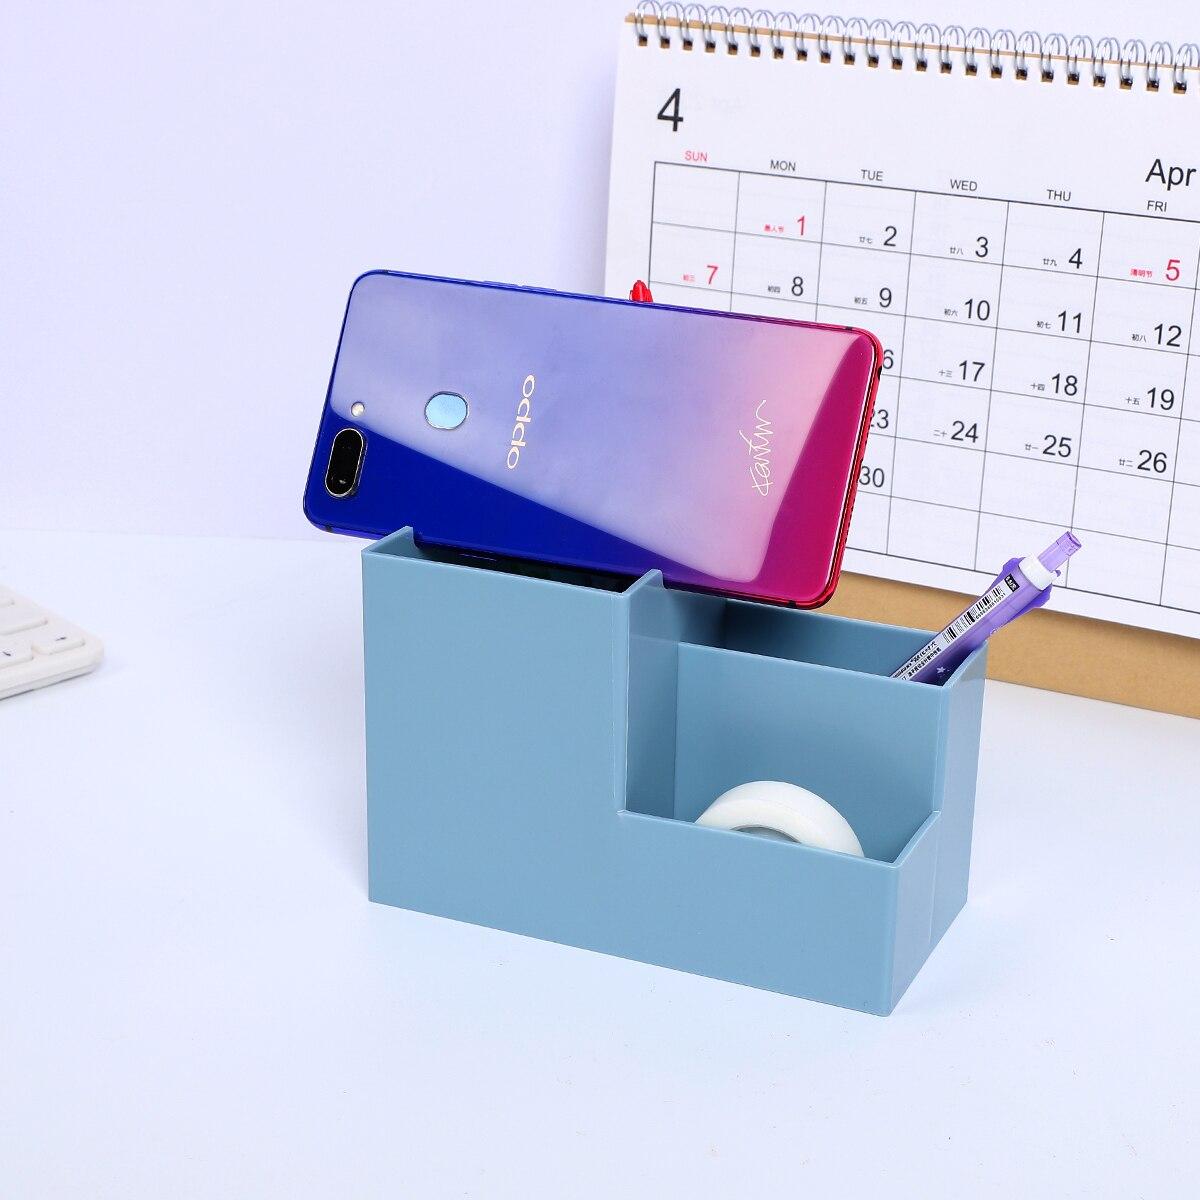 1pc Smart Phone Stand Desk Bracket With Multi-function Pen Pencil Holder Desk Decoration Mobile Phone Holder Organizer